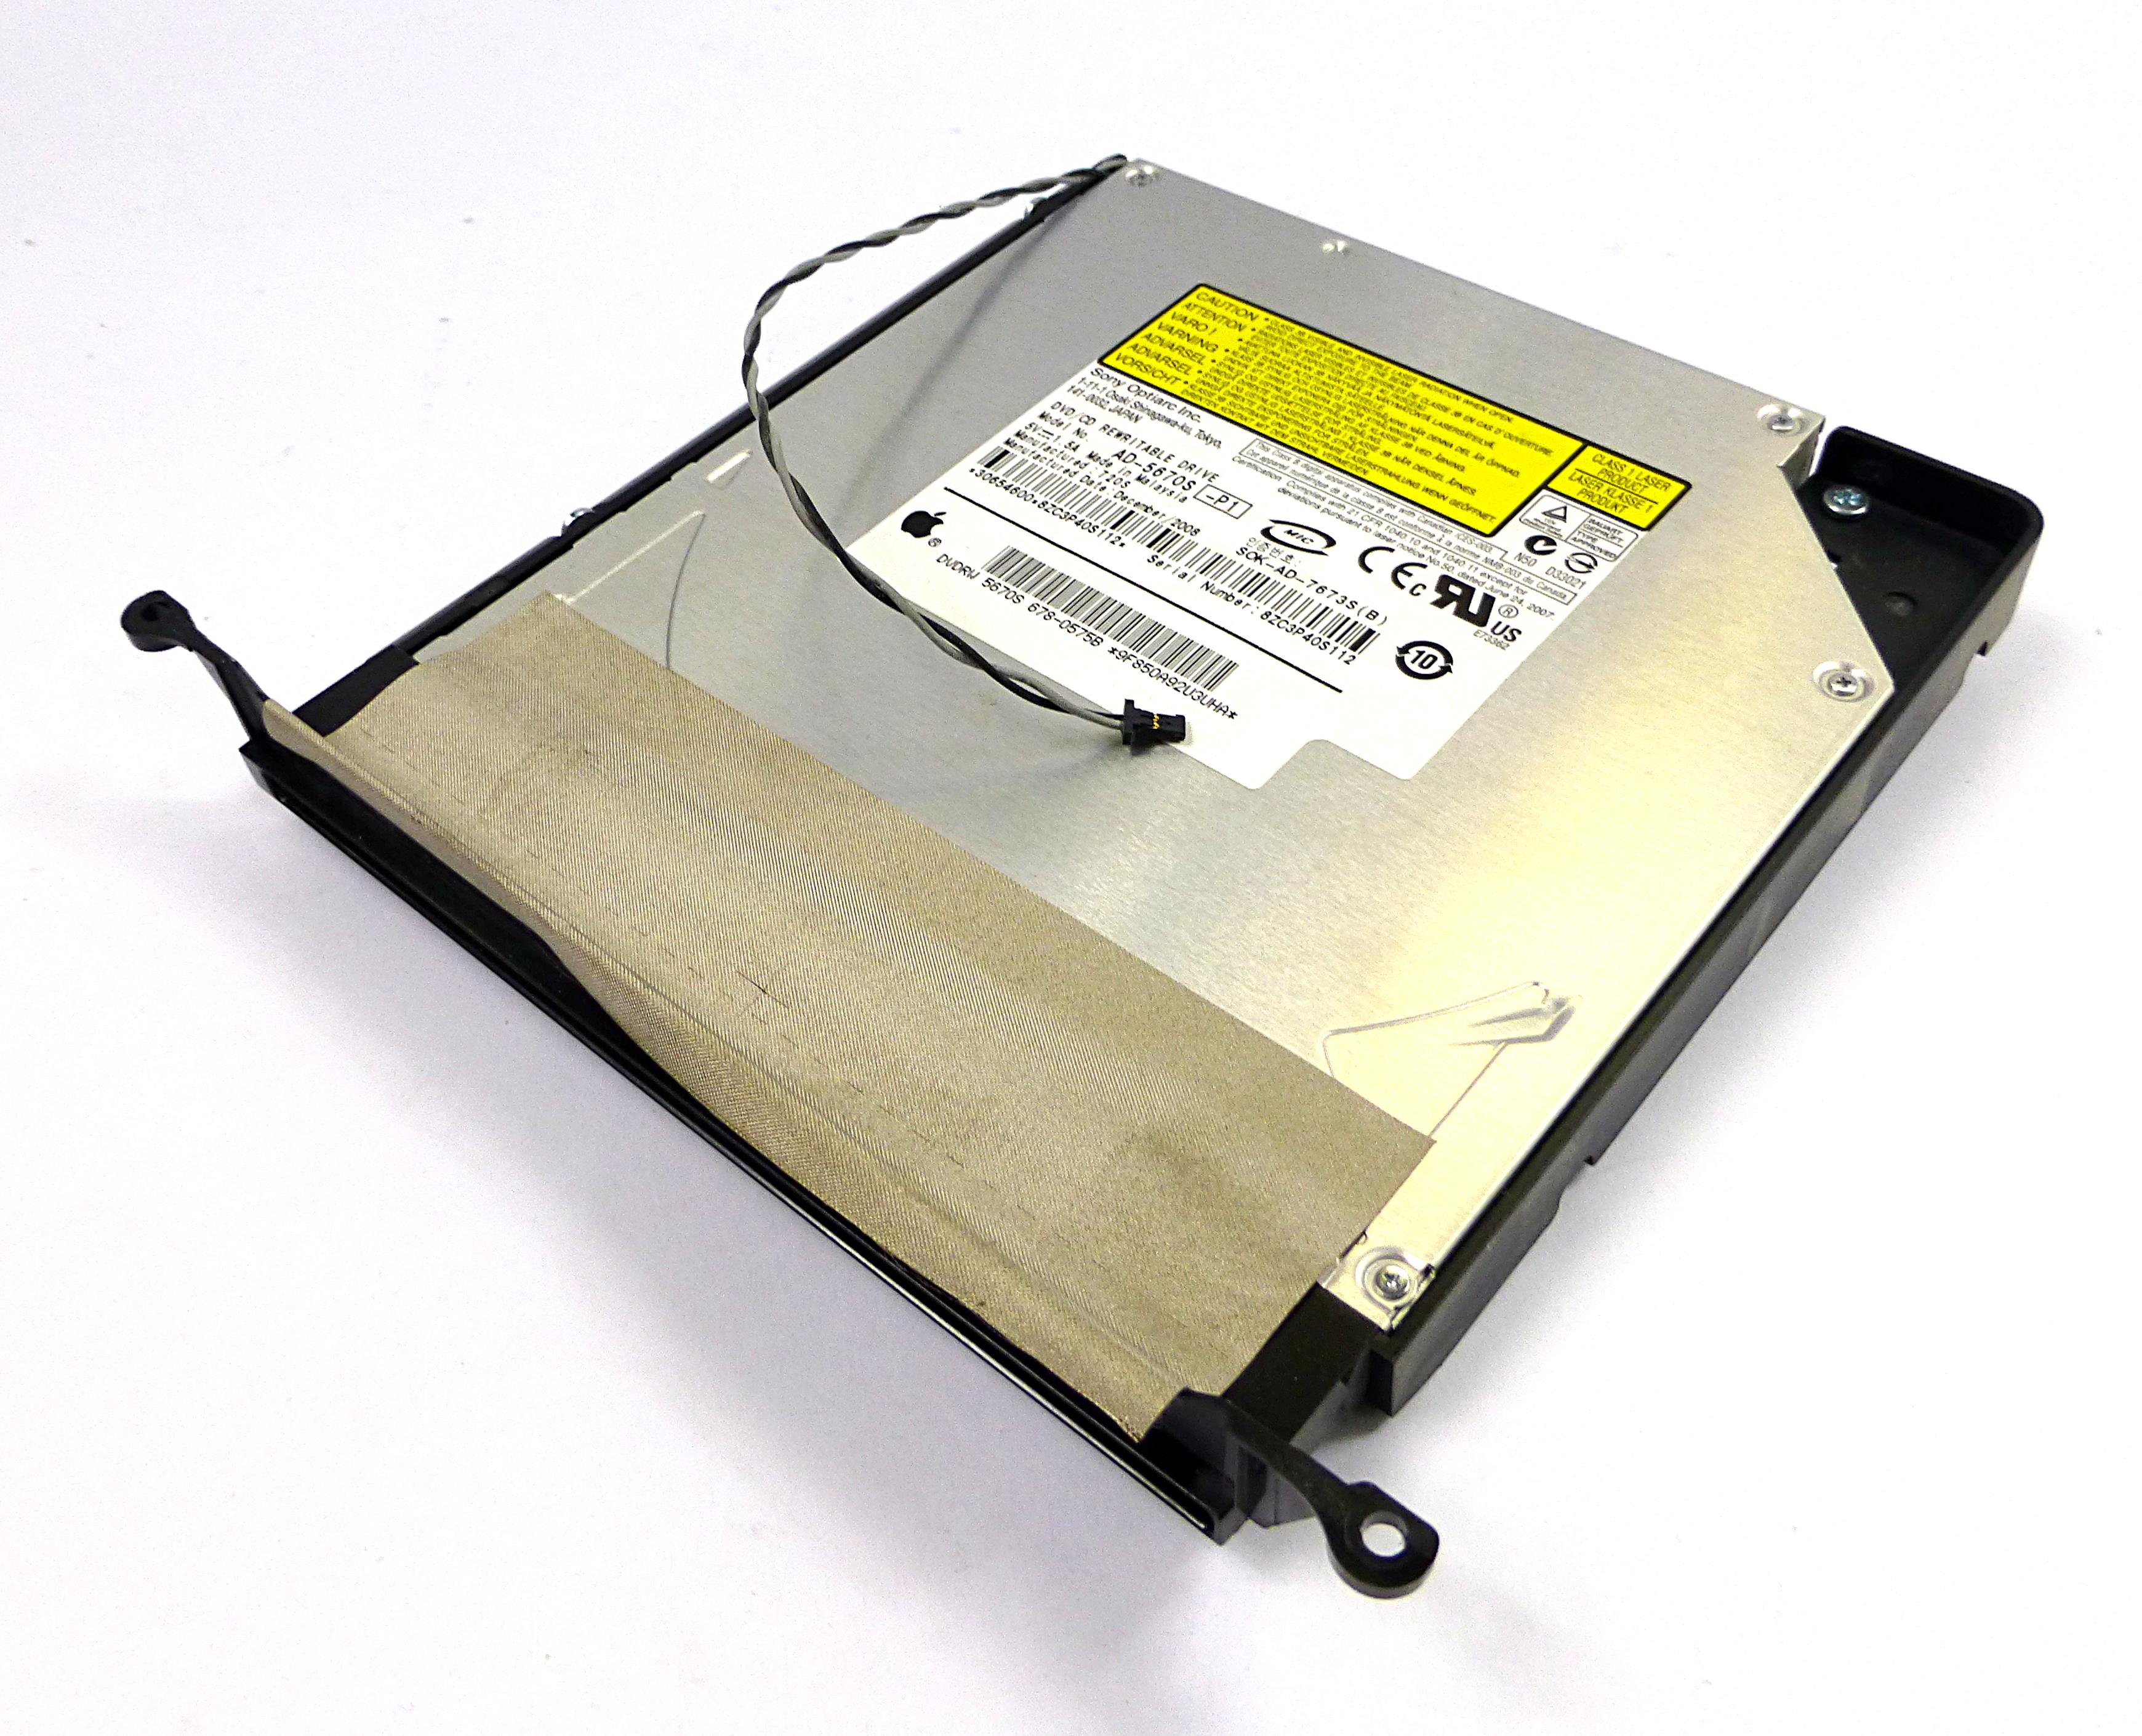 Apple 678-0575B AD-5670S-P1 SATA DVD/CD Rewritable Slot-Loading Optical Drive